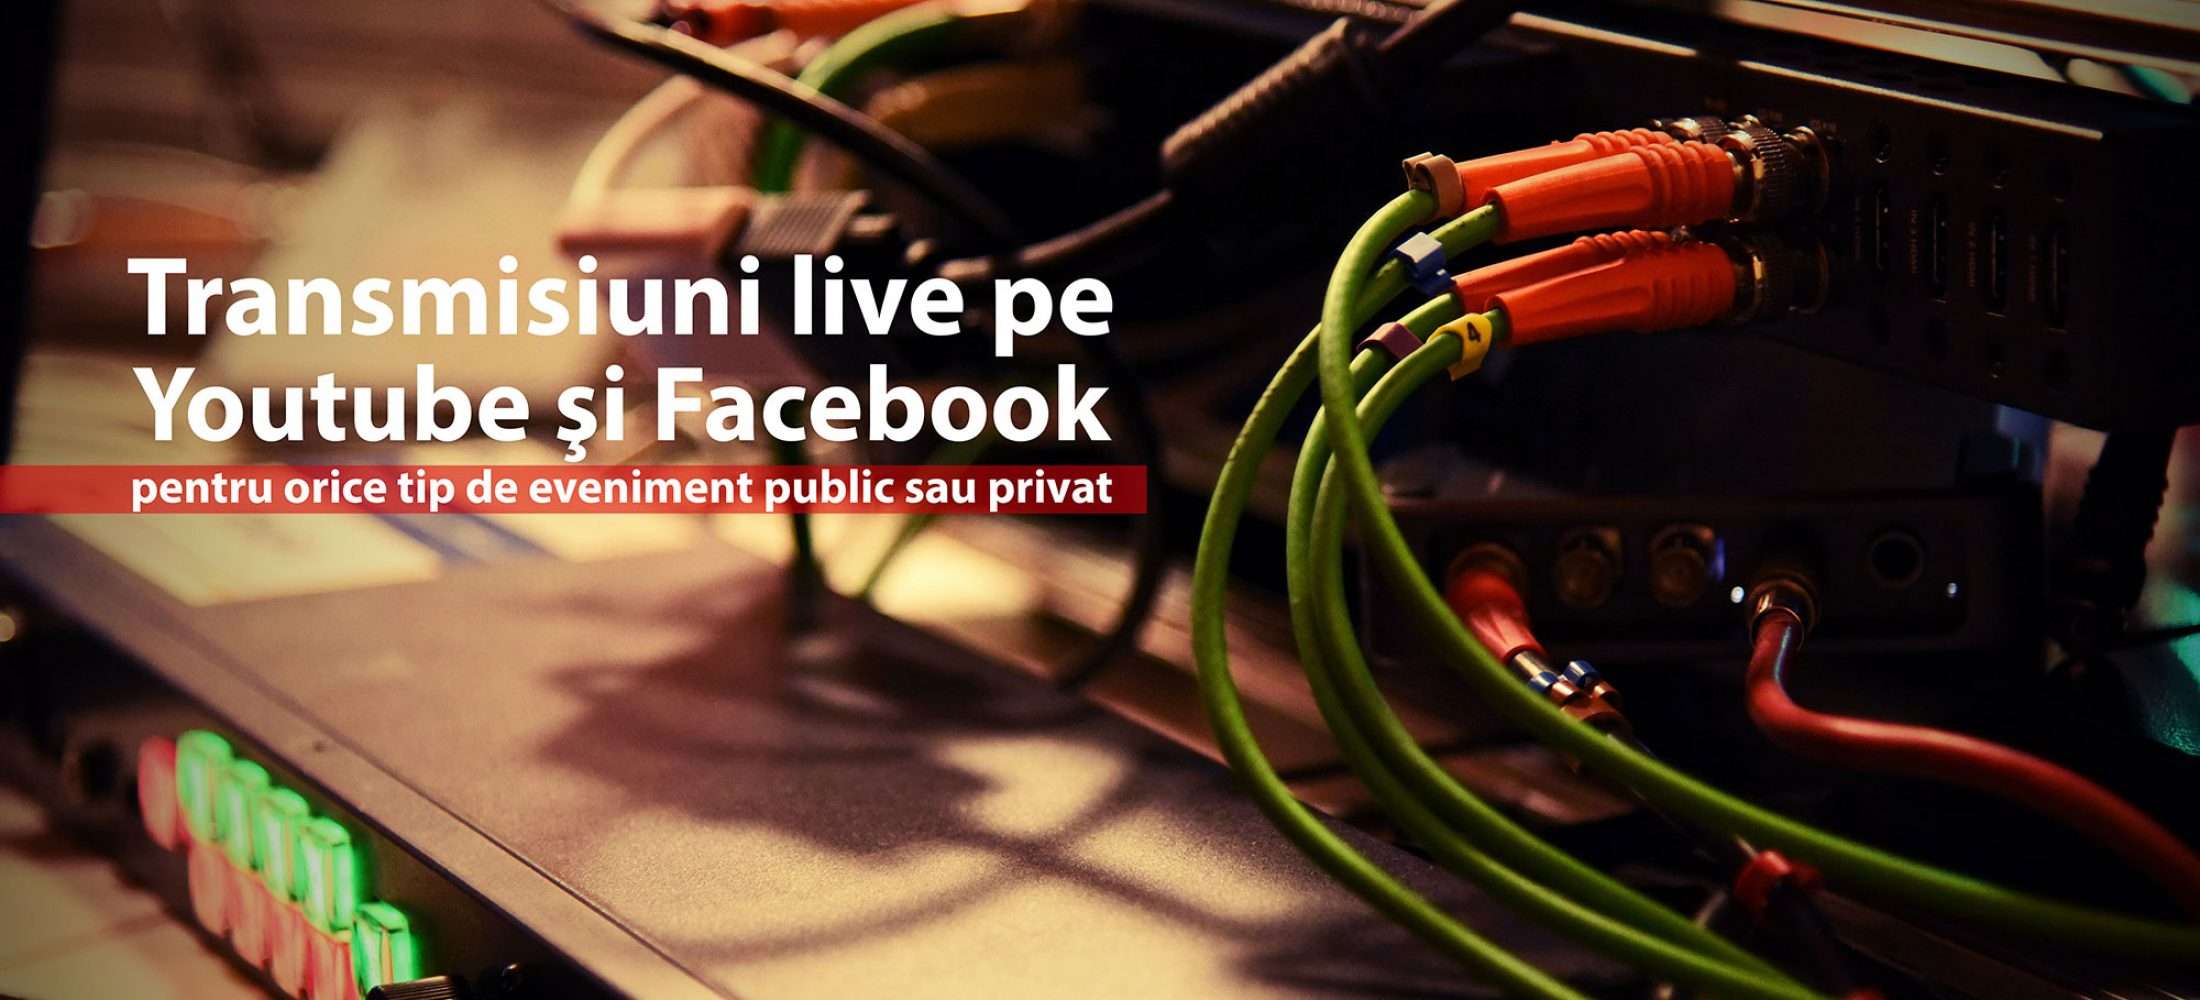 01__refacuta-de-trimis_Transmisiuni-youtube-si-facebook